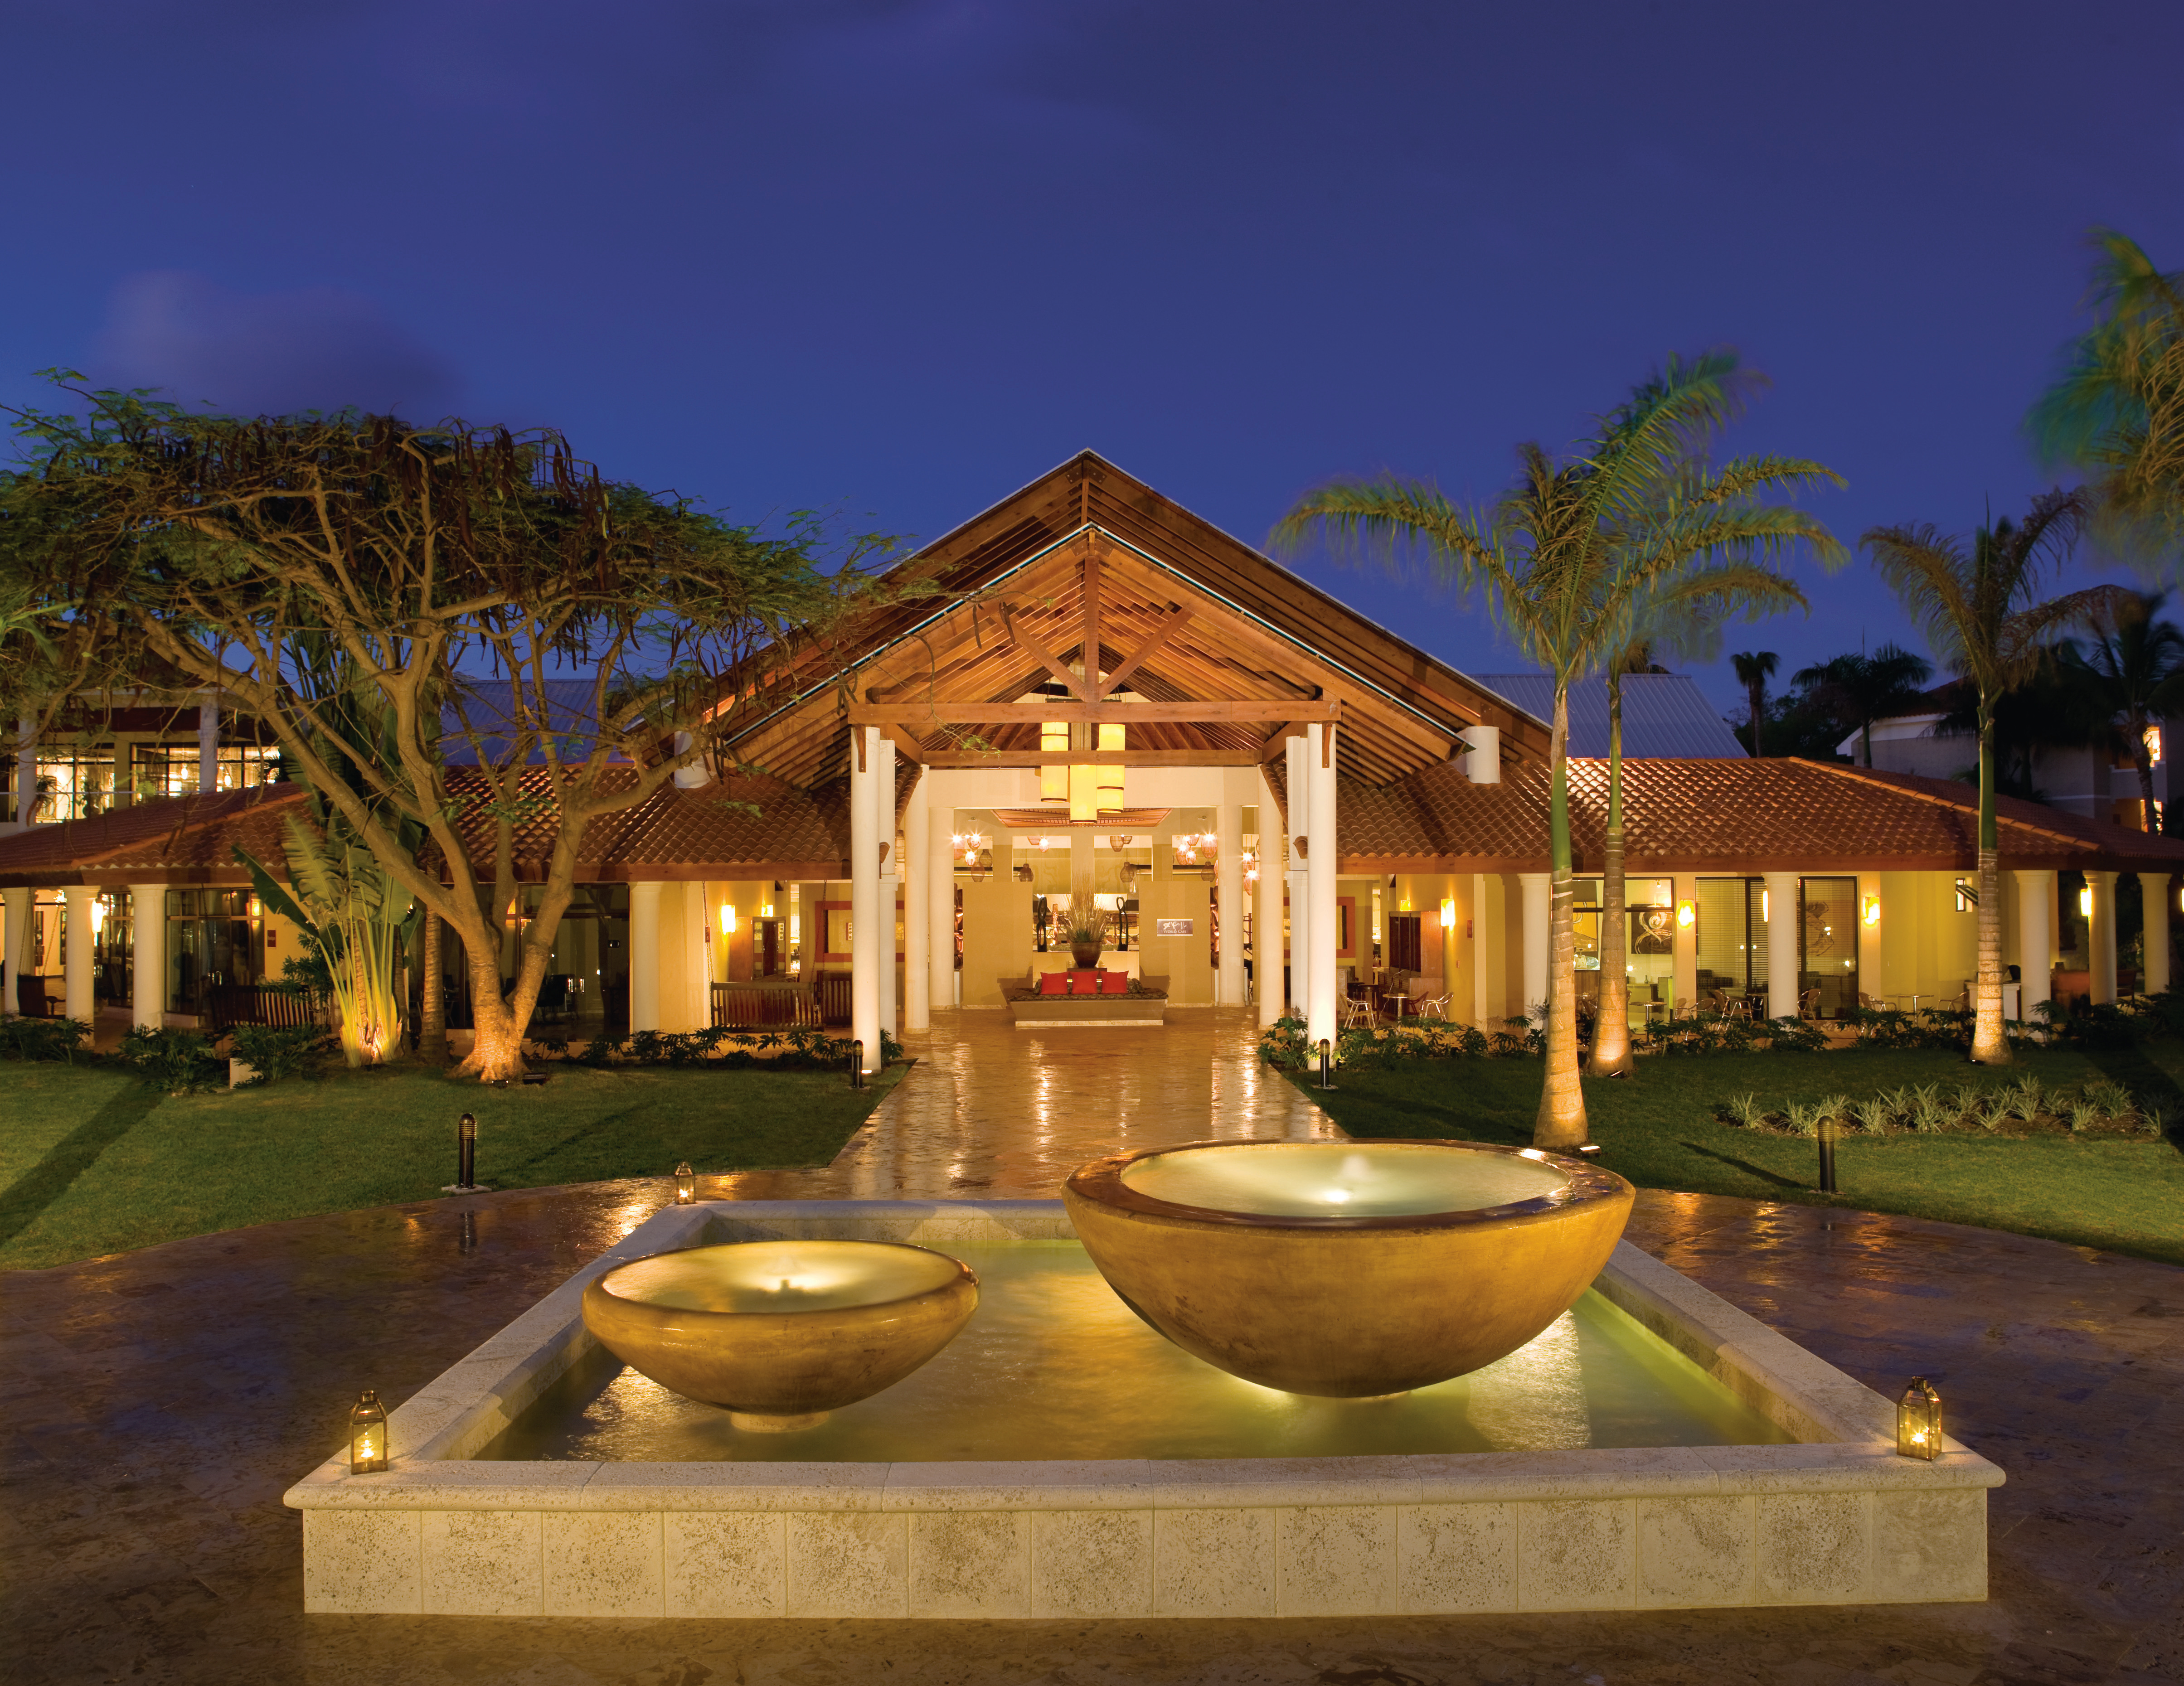 Travel Agency All-Inclusive Resort Dreams Palm Beach 45